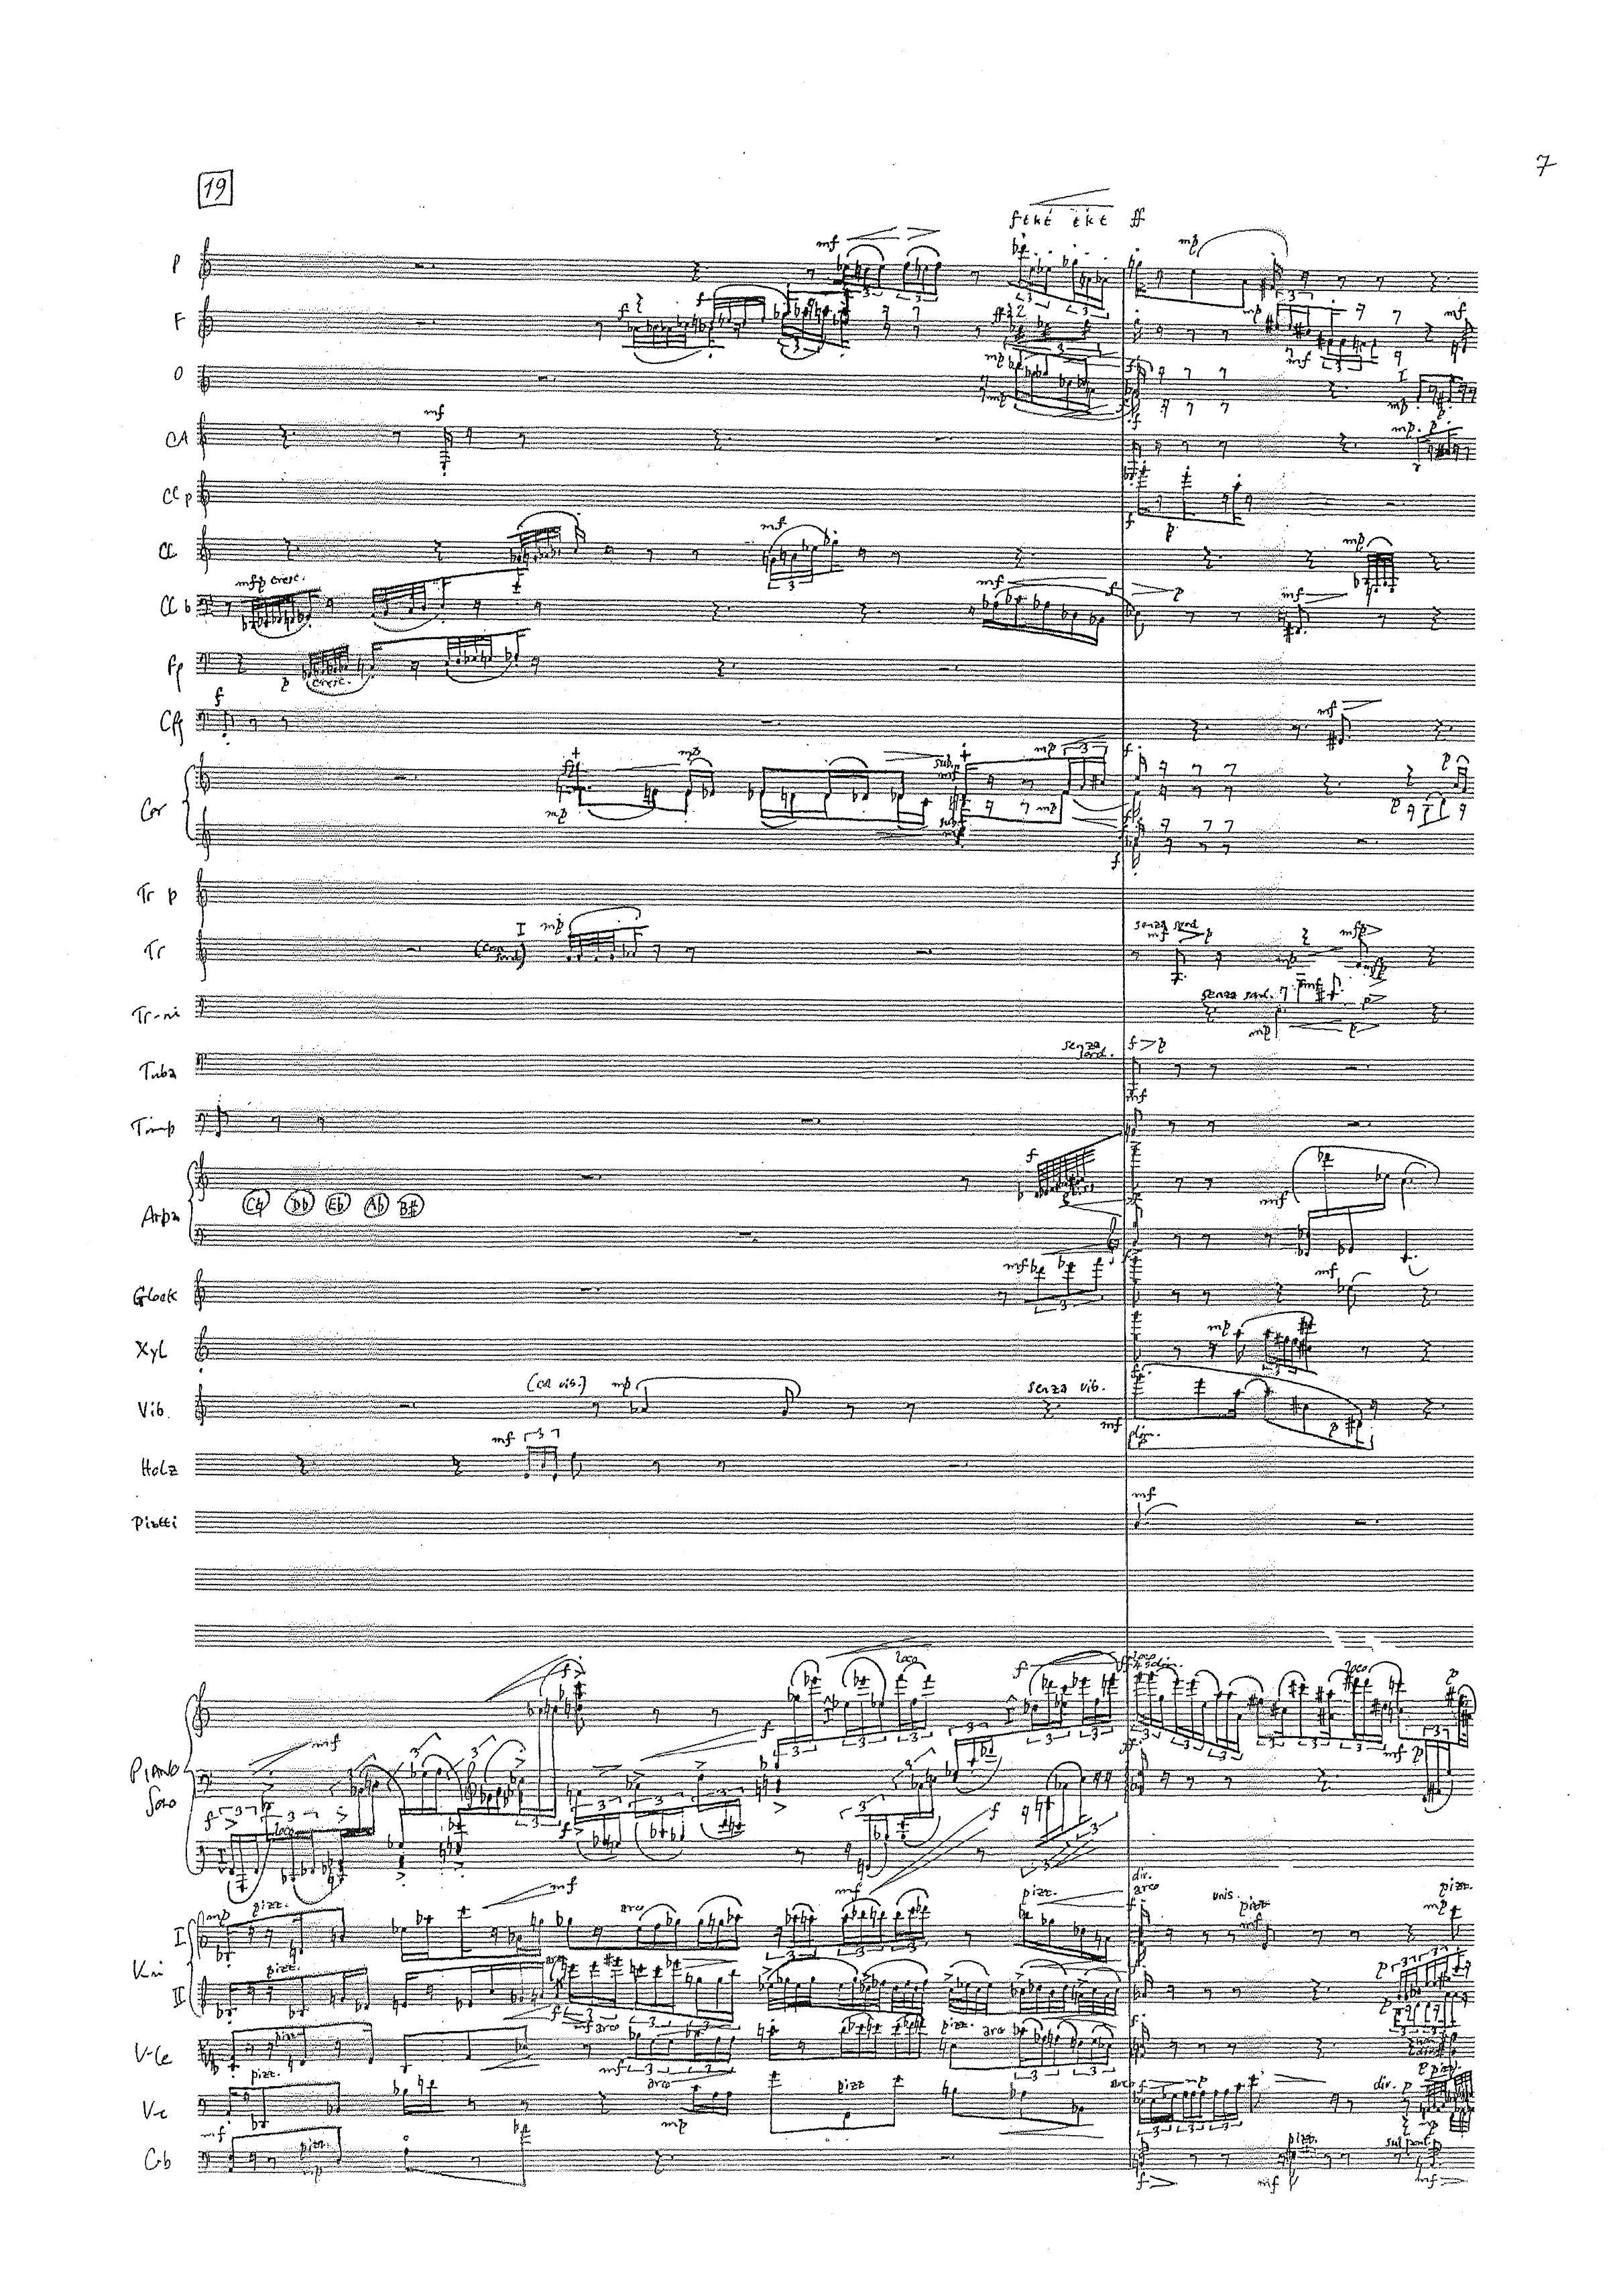 The Sorabji Archive — Alistair Hinton — Compositions